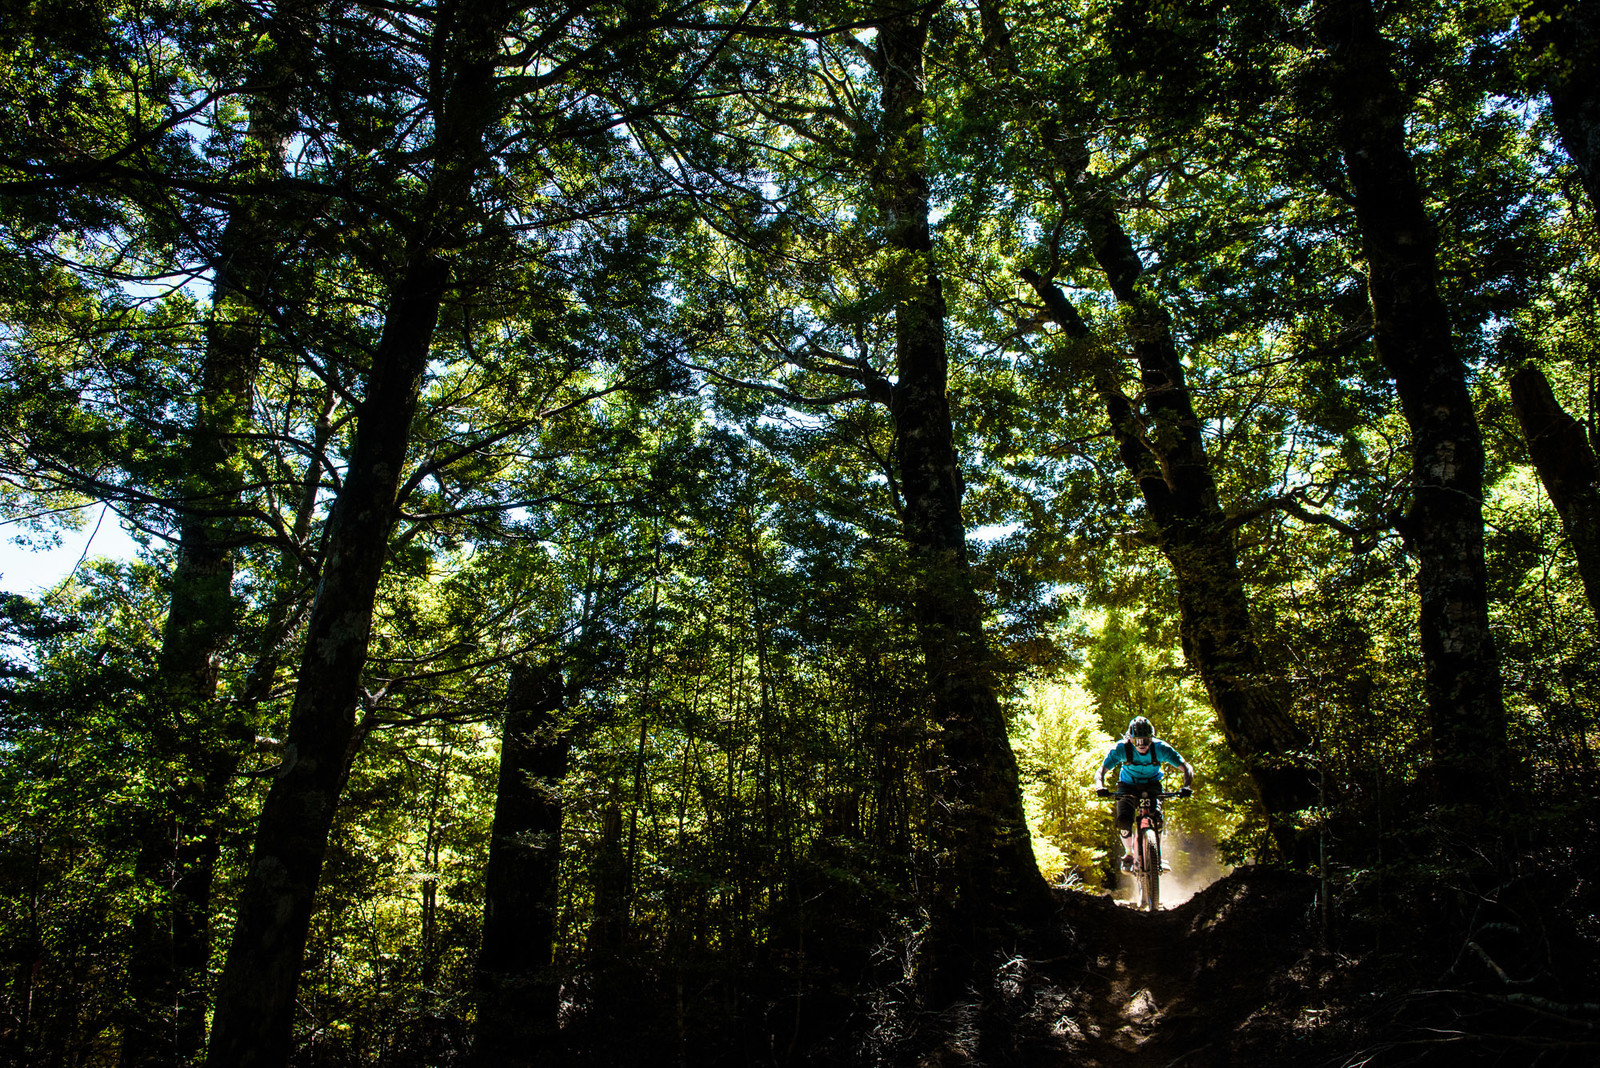 Flo De Vries, Hardtail - 2019 Dodzy Memorial Enduro - Mountain Biking Pictures - Vital MTB